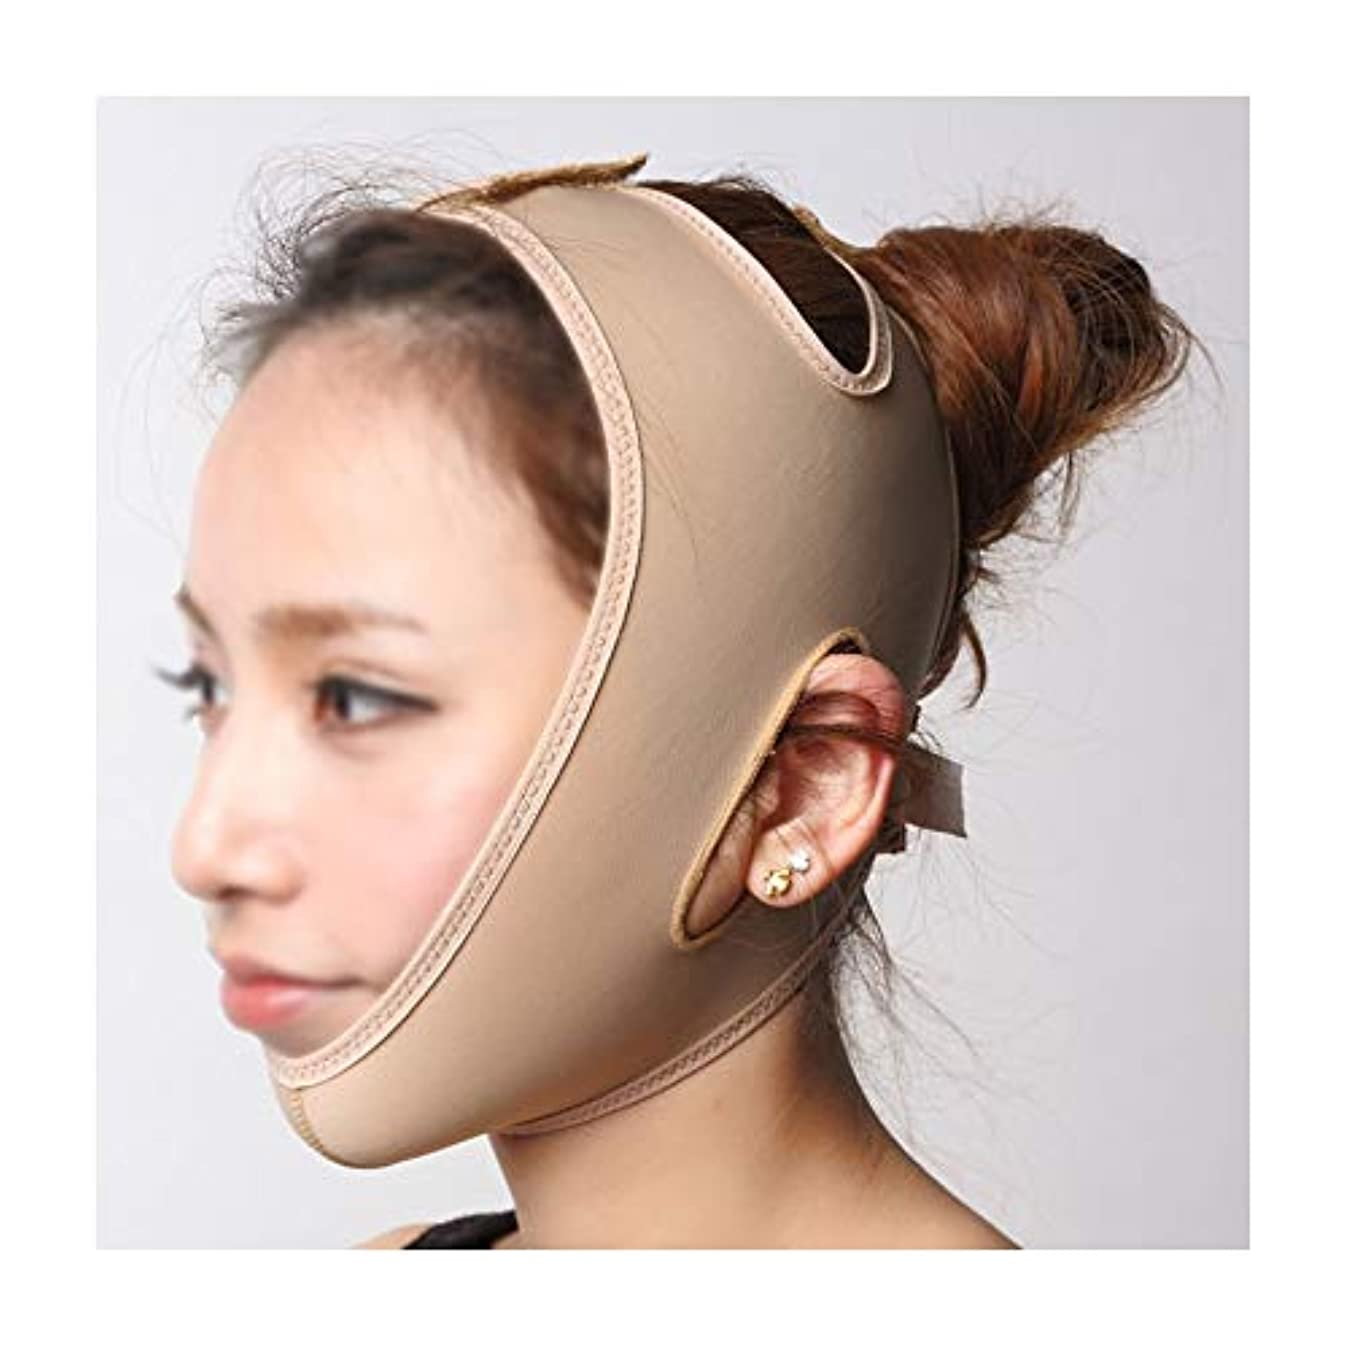 XHLMRMJ 引き締めフェイスマスク、睡眠薄い顔包帯薄いフェイスマスクフェイスリフティングフェイスメロンフェイスVフェイスリフティング引き締め二重あご美容ツール (Size : XL)